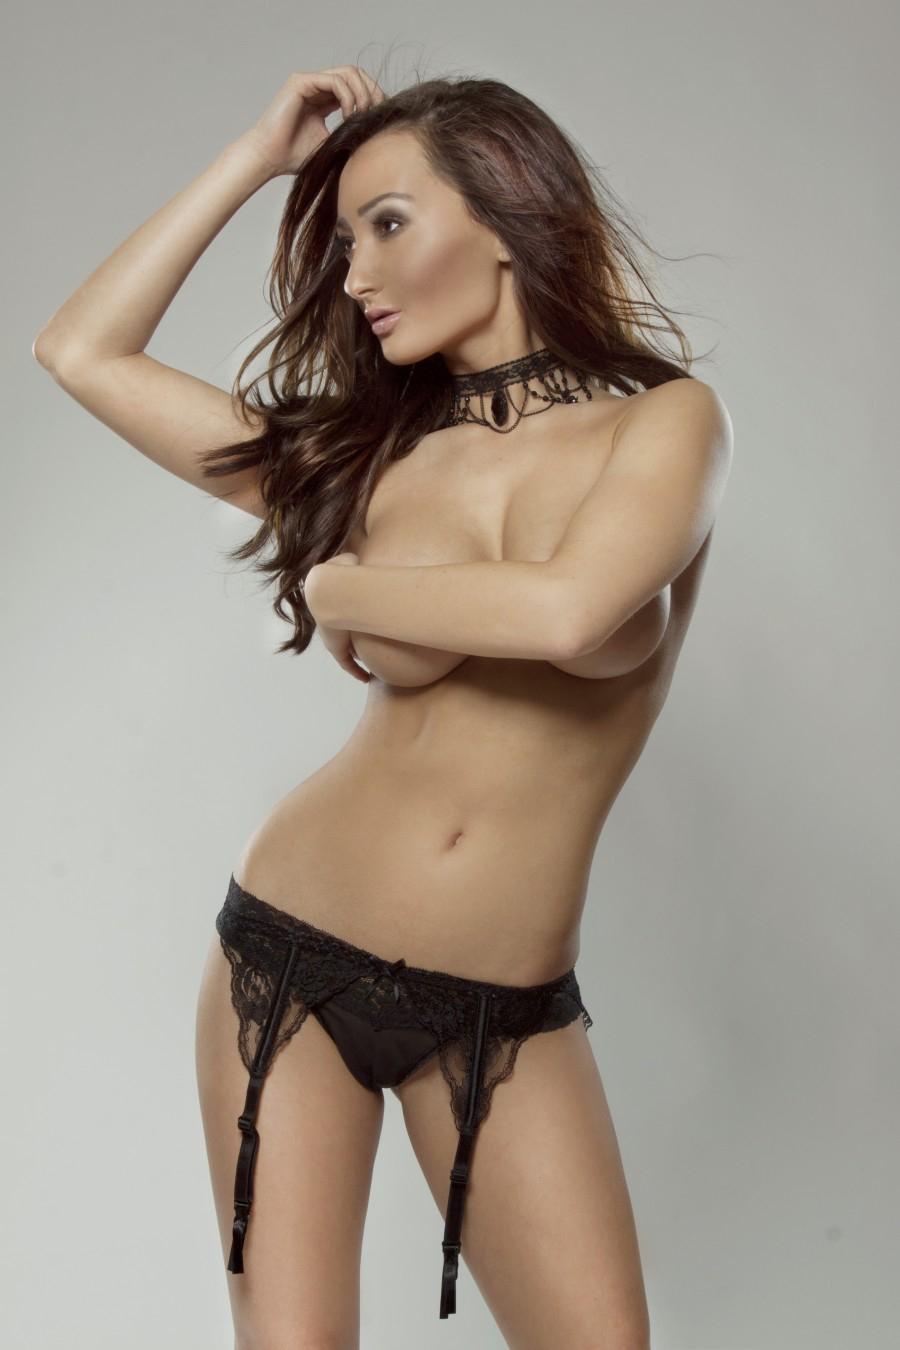 Amy Markham nudes (24 photos) Boobs, Twitter, see through